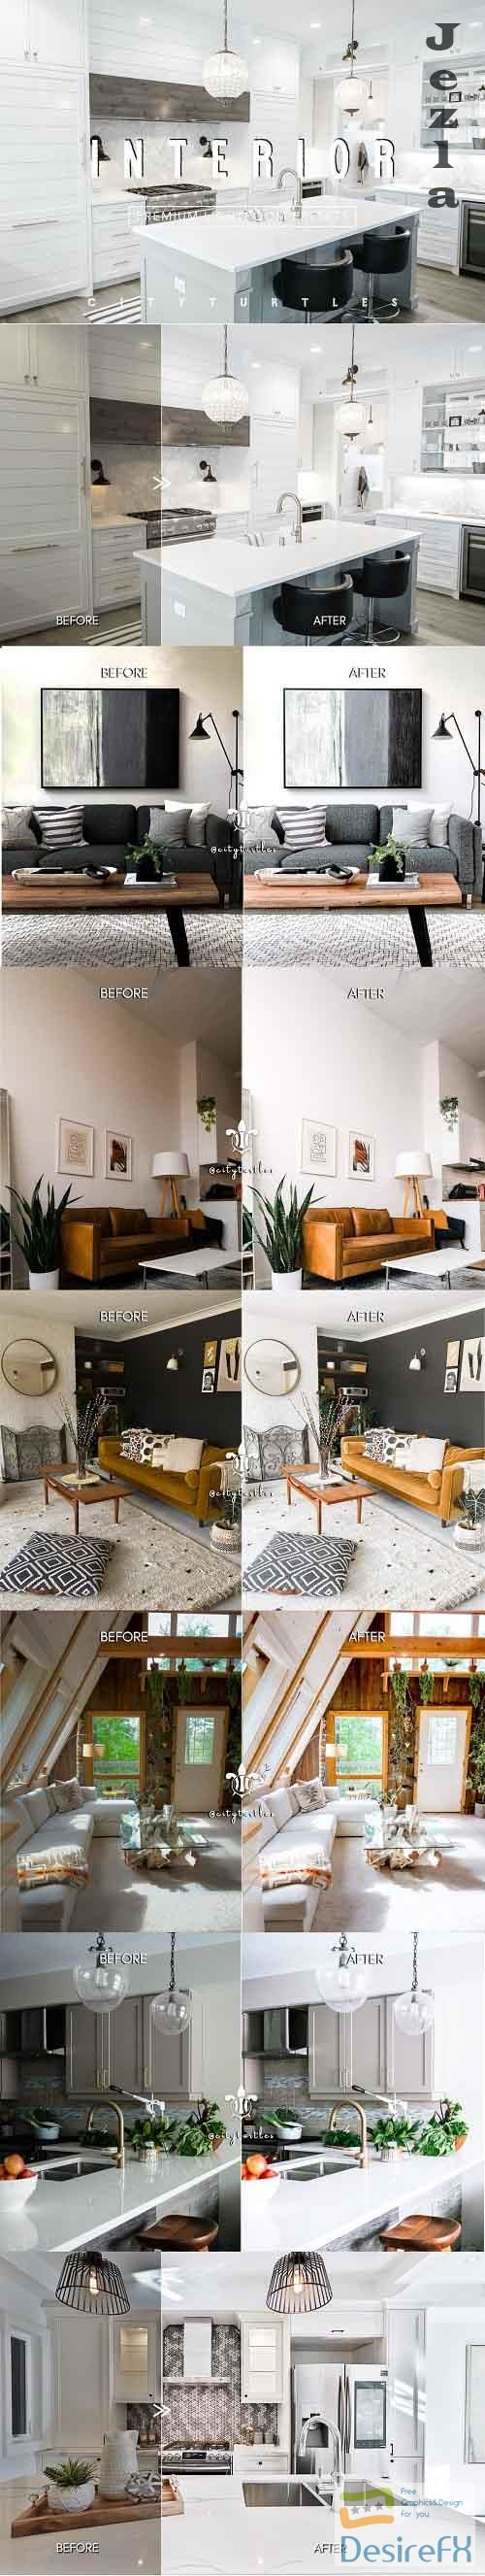 Bright Interior Desktop Presets - 5033109